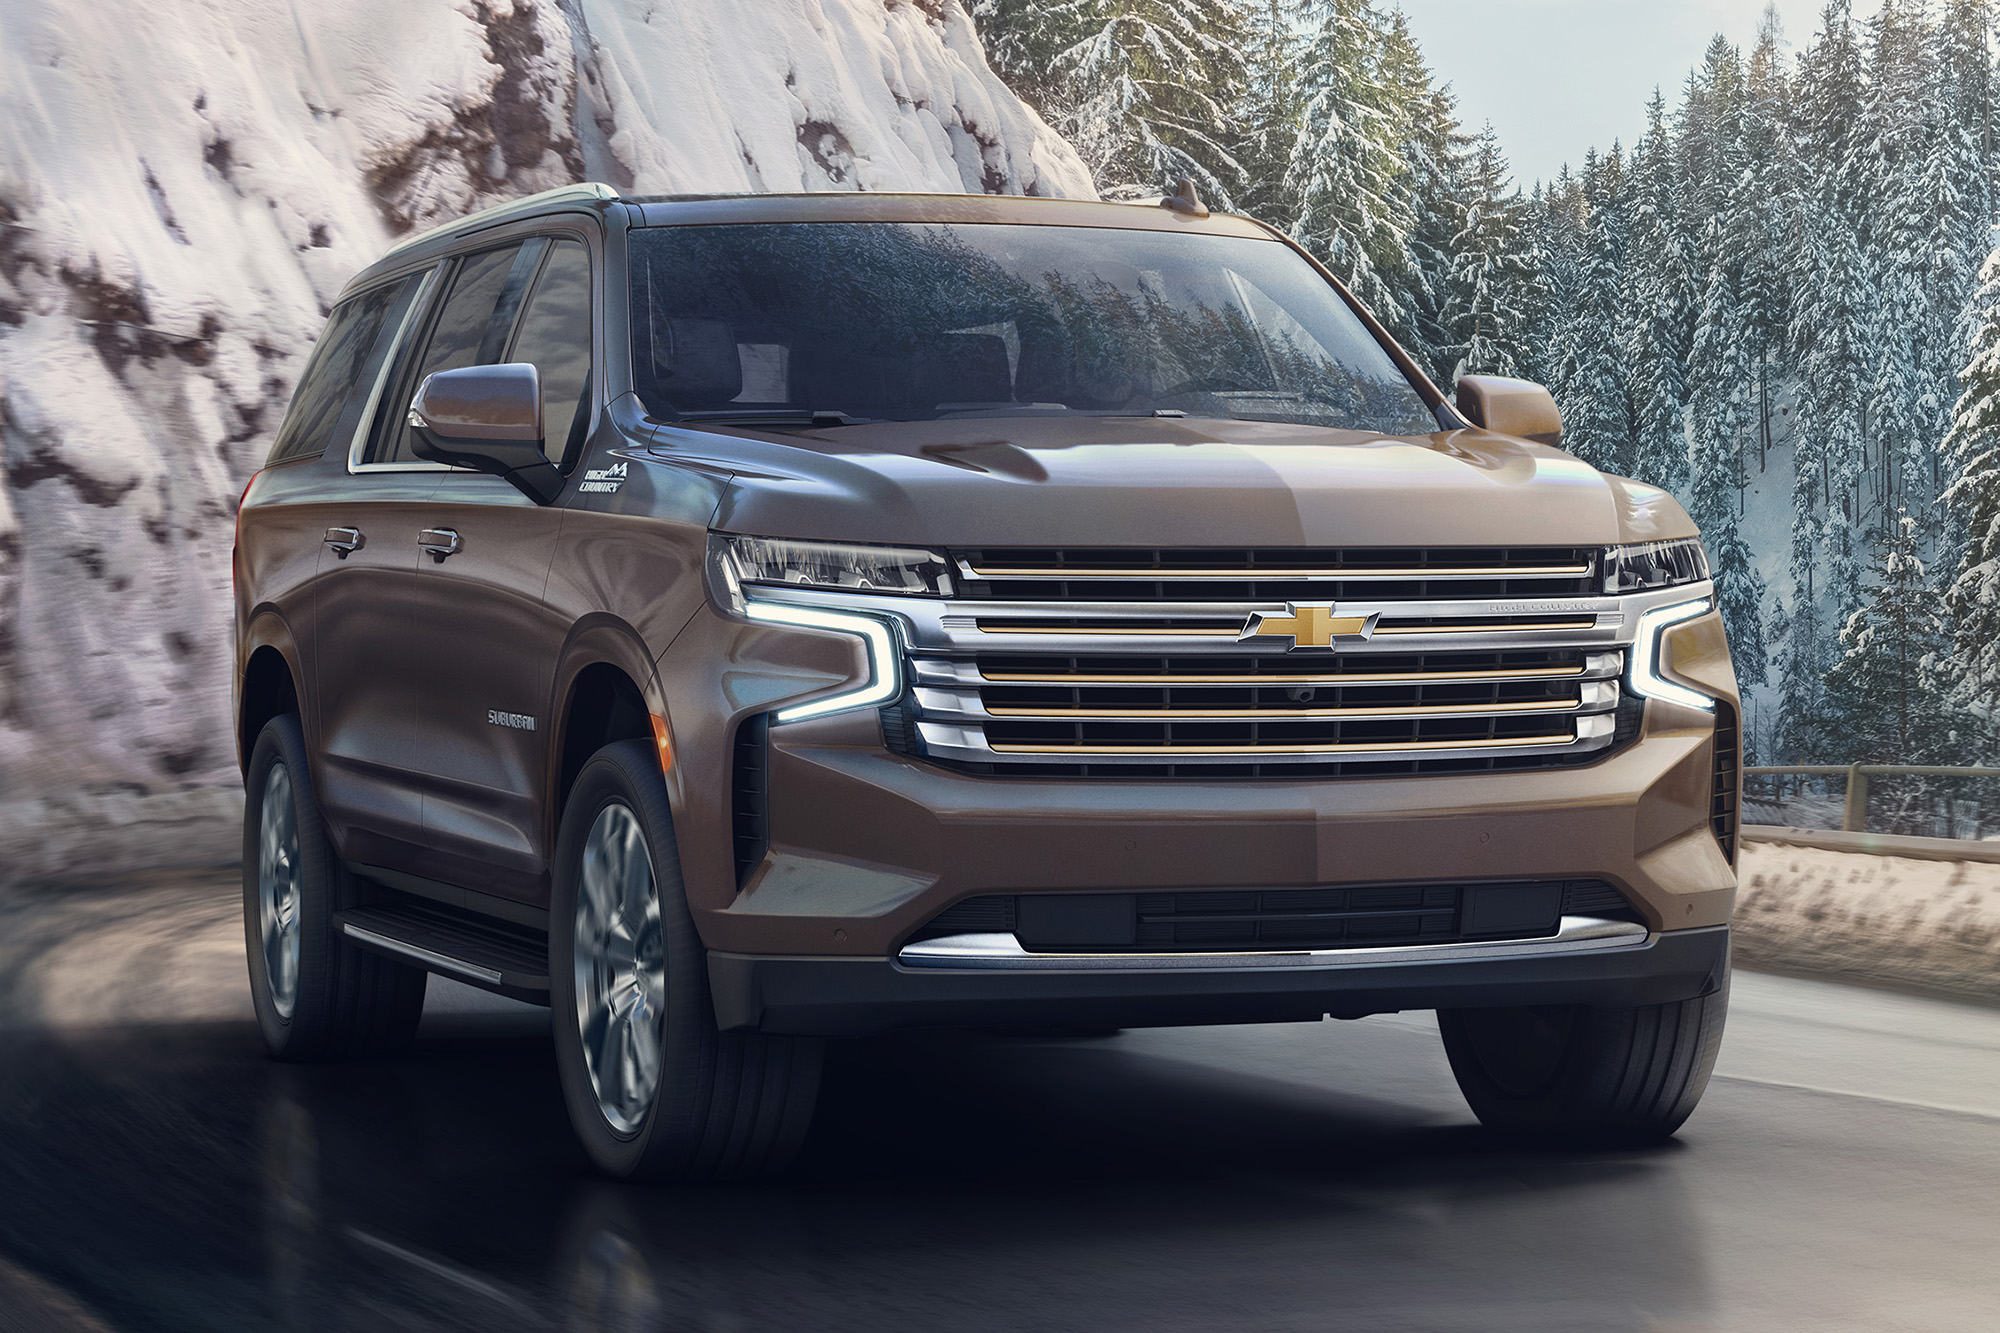 Chevrolet Suburban marrom visto 3/4 de frente